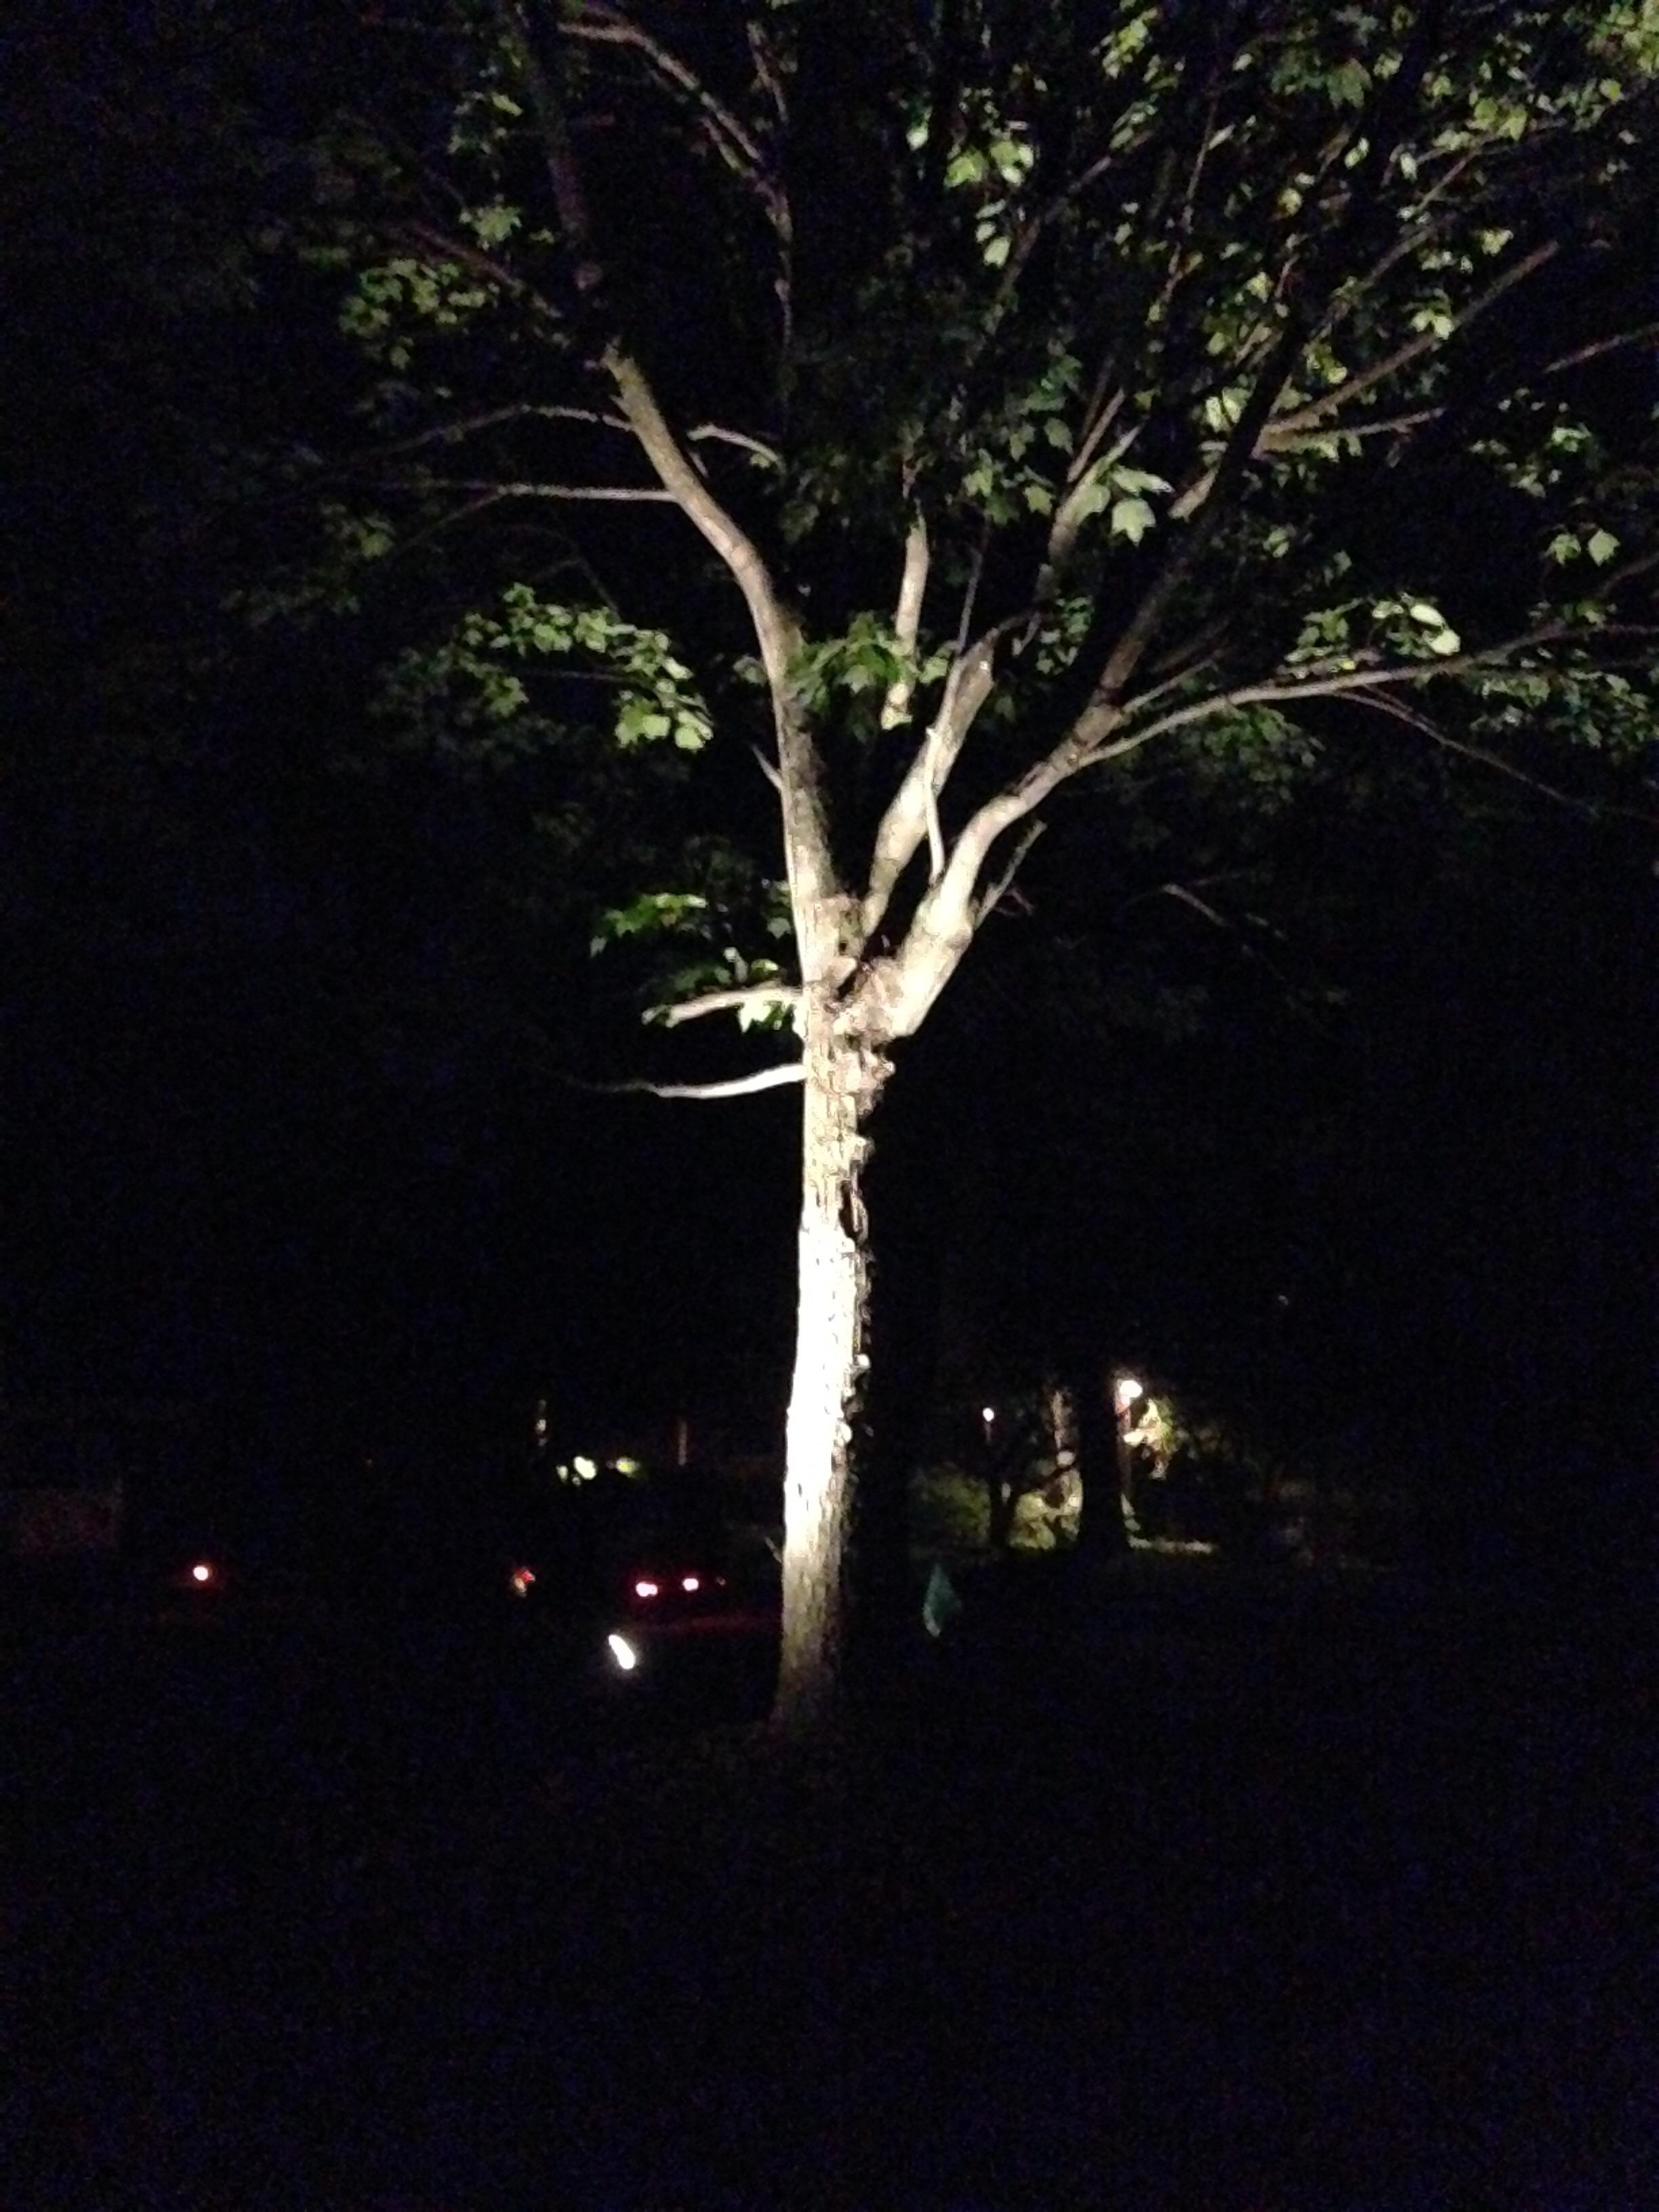 Carmel Outdoor Lighting Services